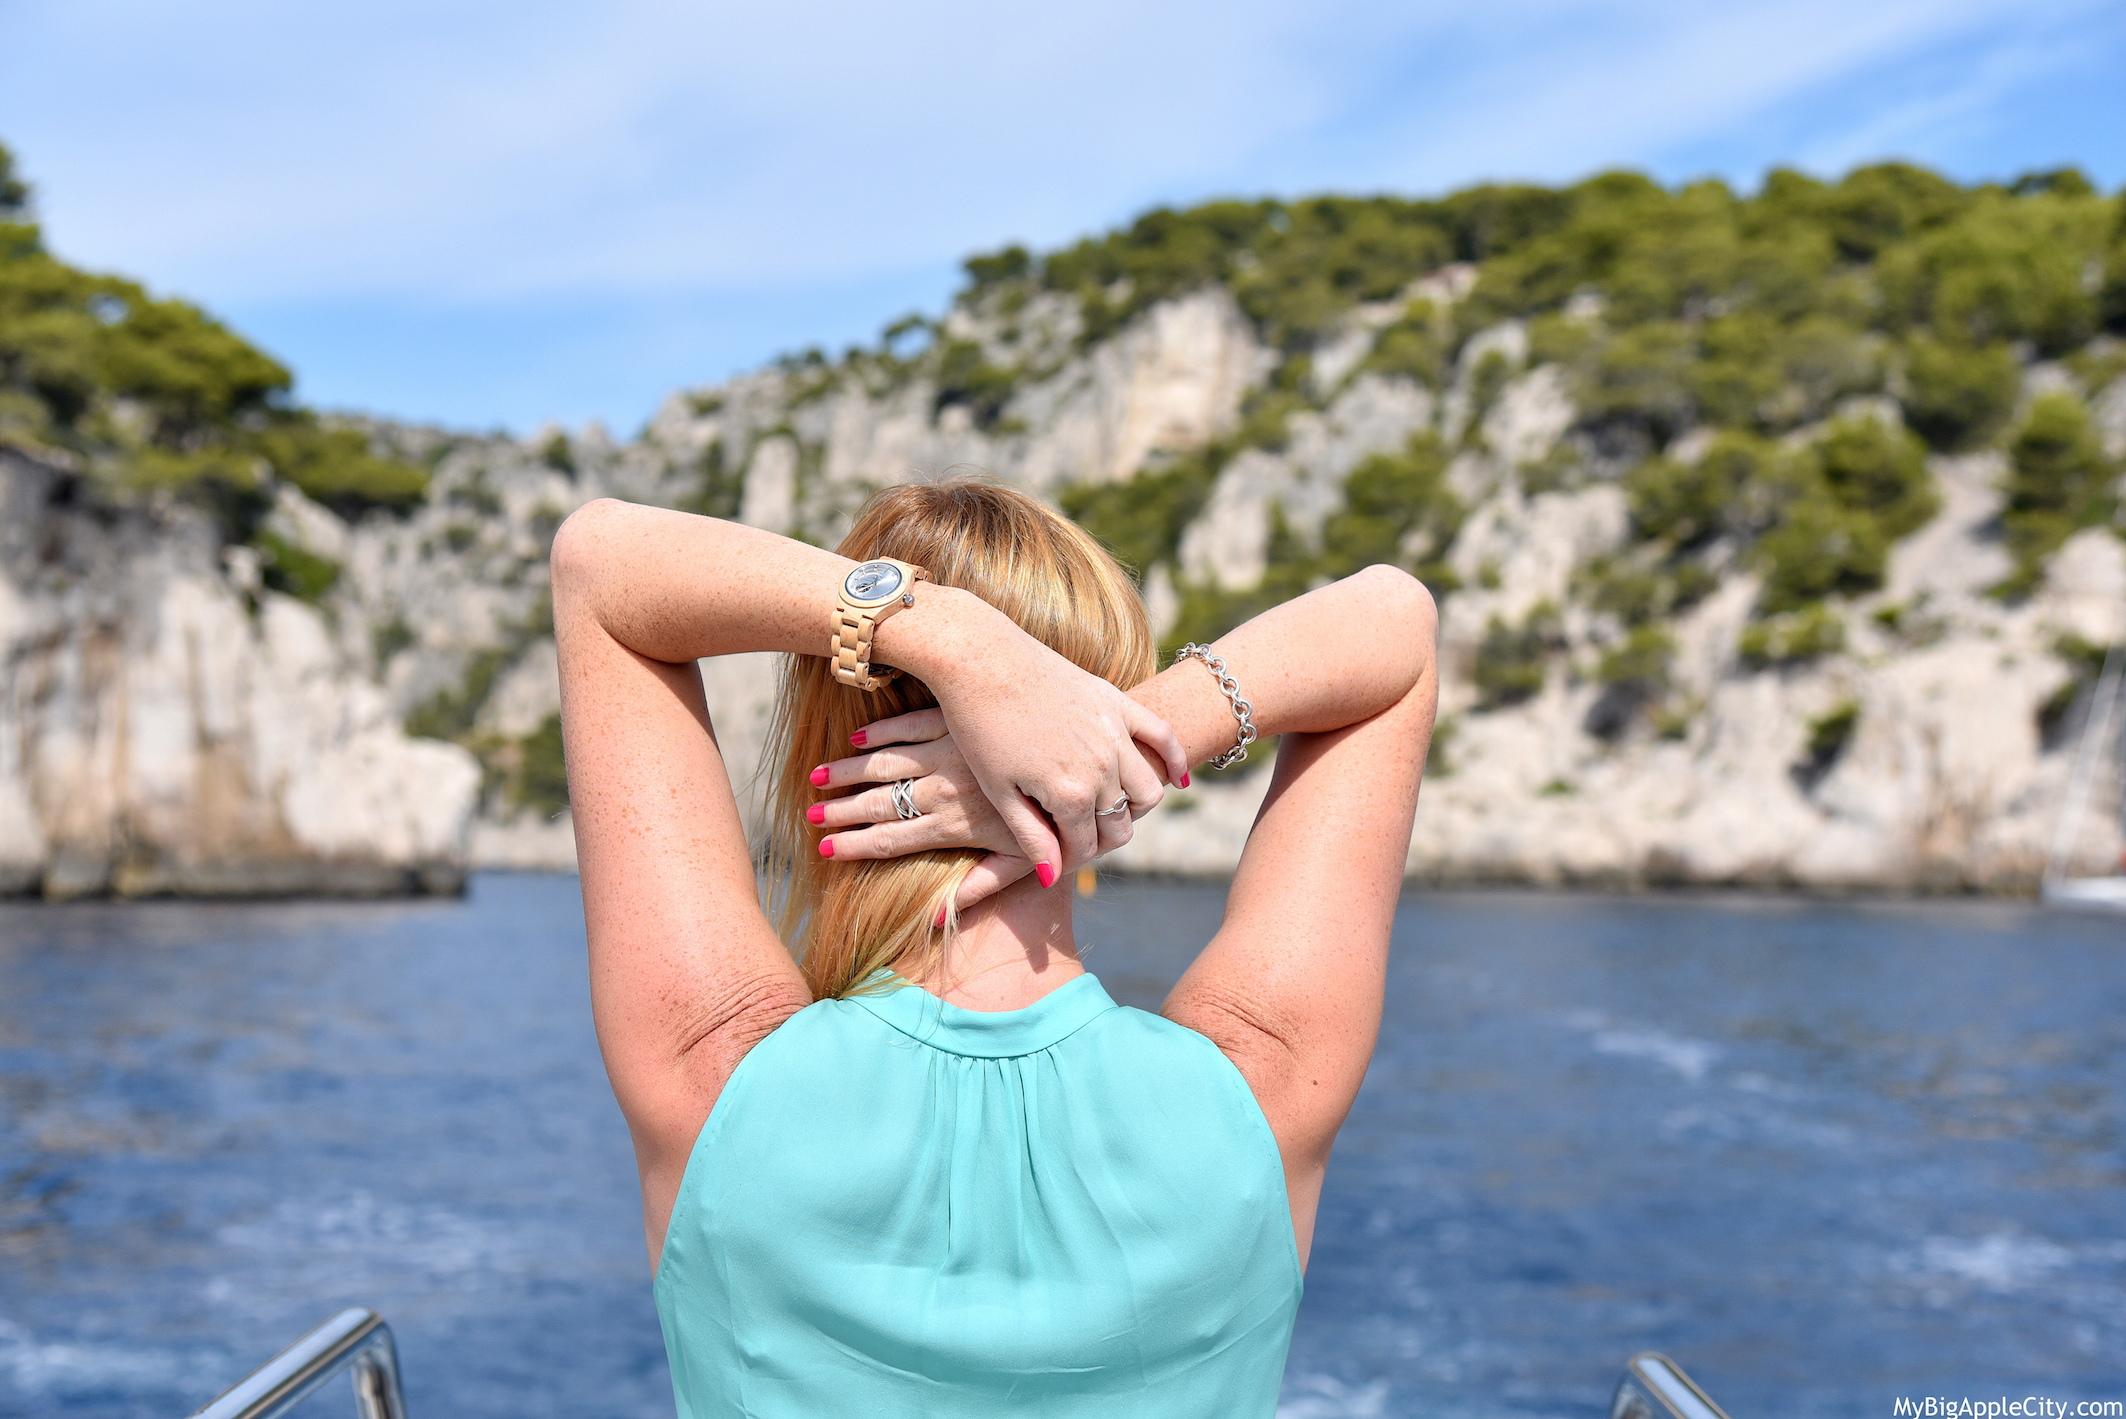 Travel-blogger-Fashion-Collab-Jord-wood-watches-MyBigAppleCity